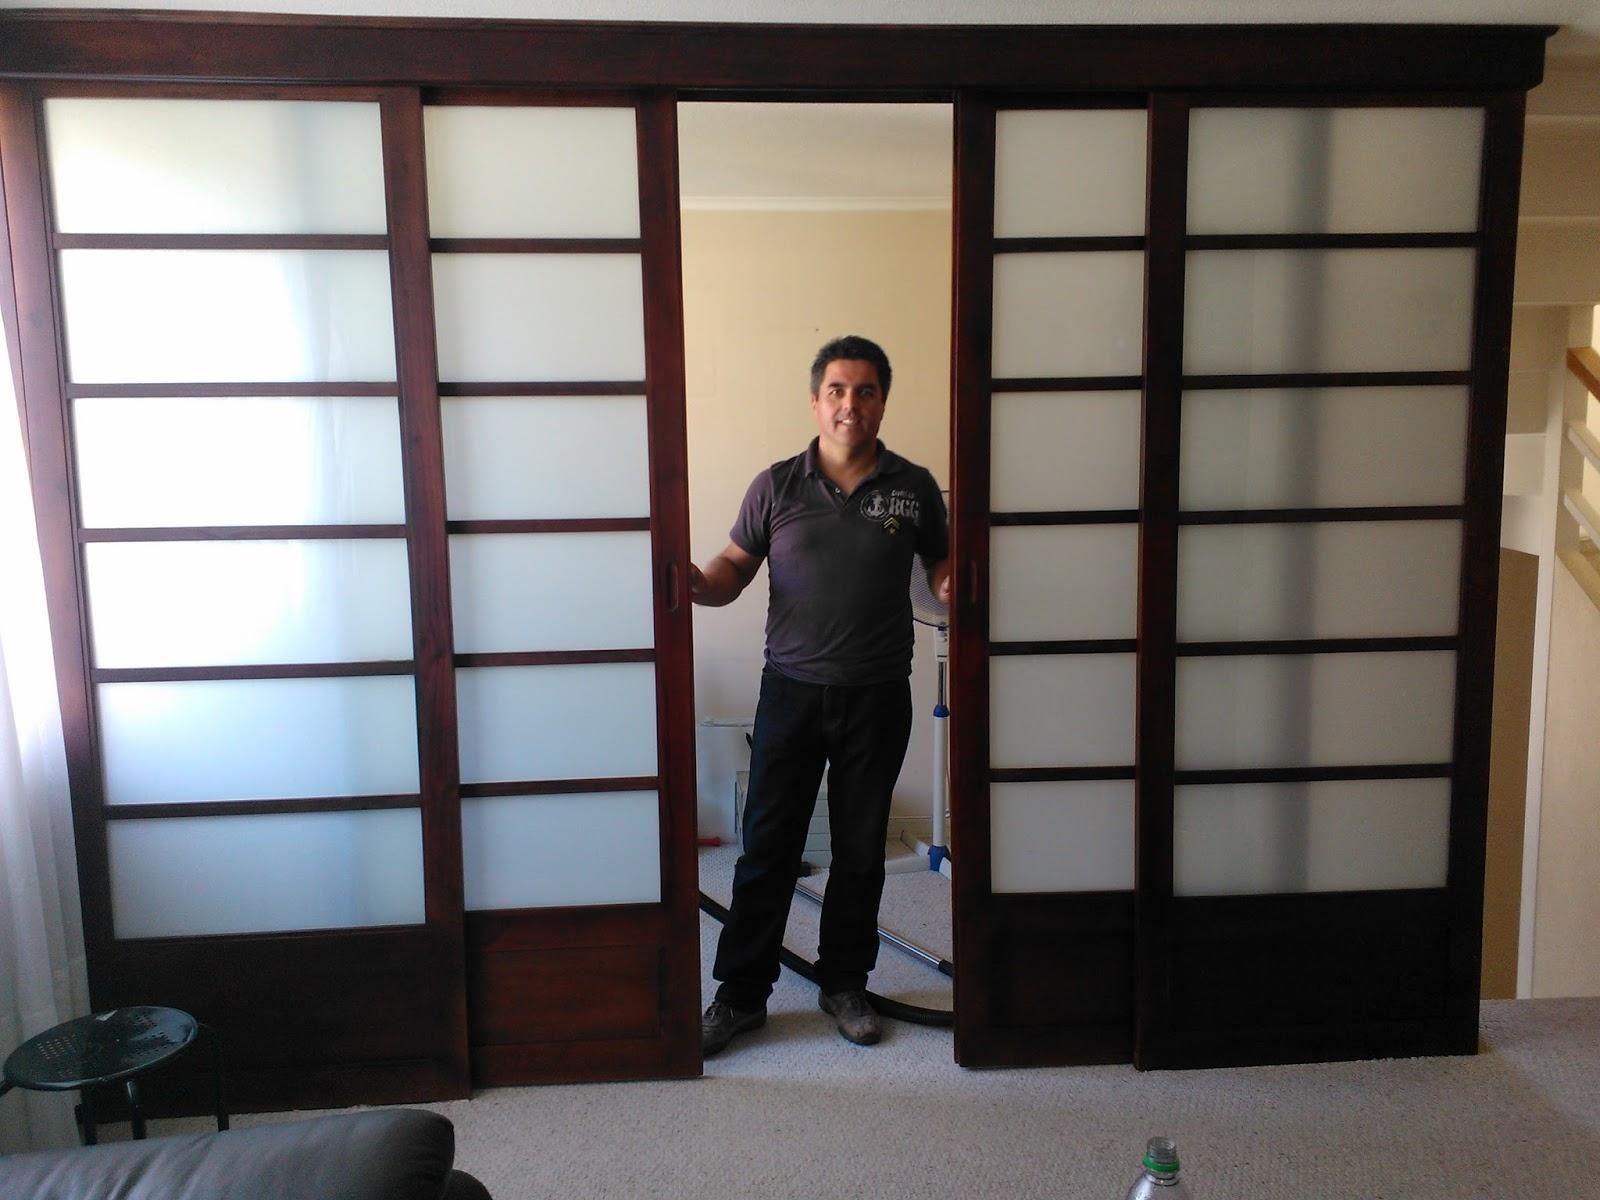 puertas japonesas puertas correderas panels japonesas